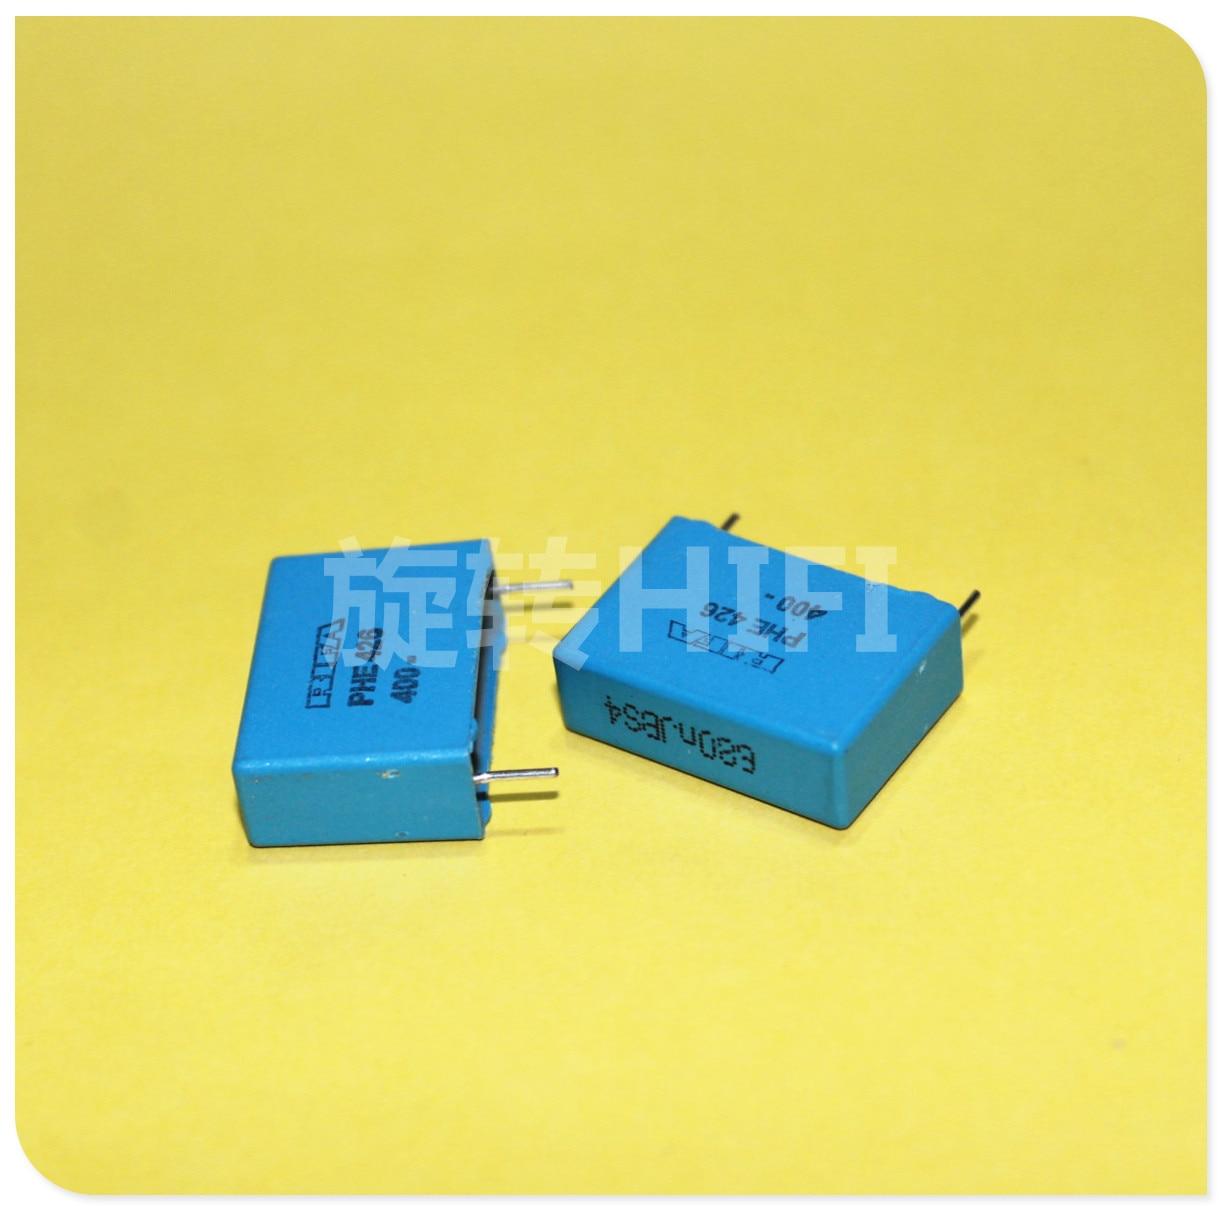 6PCS RIFA PHE426 0.68UF 400V P22.5MM MKP 684/400V Audio Blue Film Capacitor 426 0.68uf/400v 680NF 684